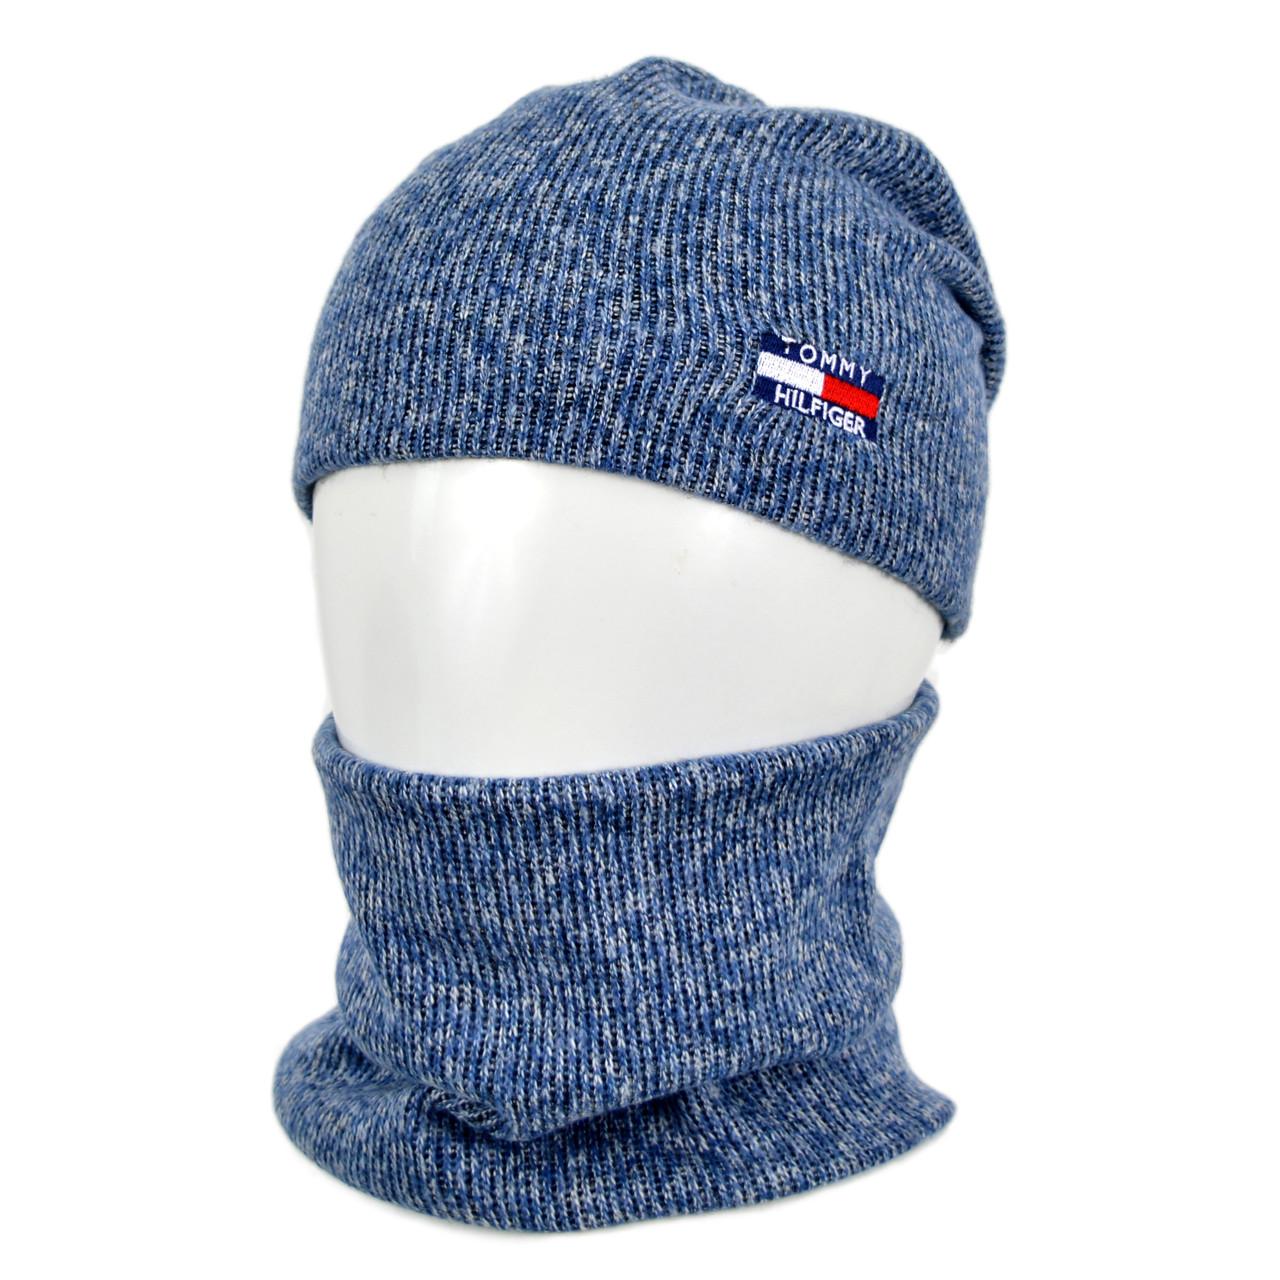 Комплект шапка+баф tomy SP1902 джинс